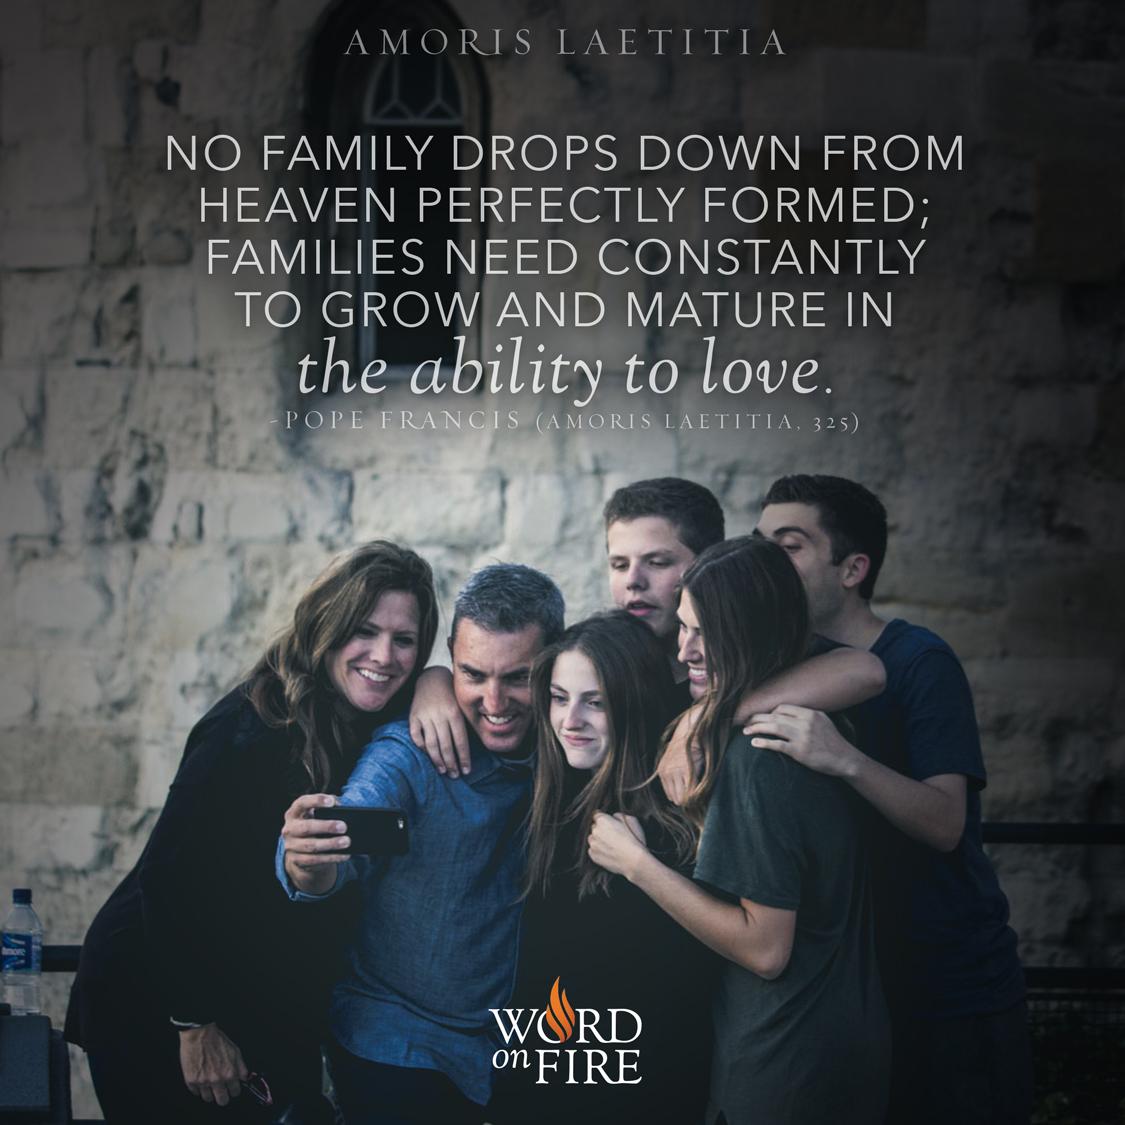 AmorisLaetitia_Family1